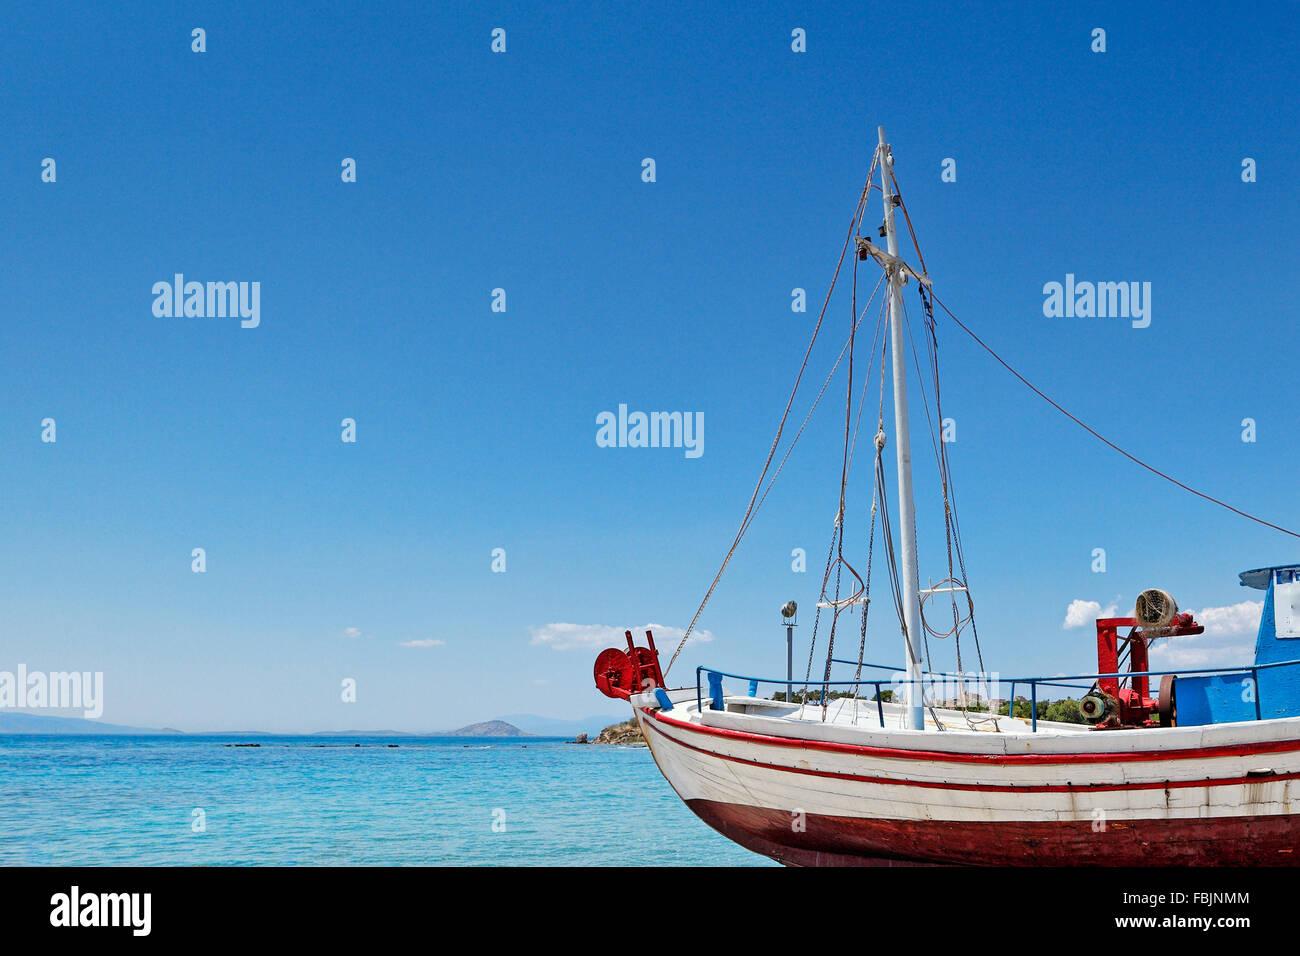 Traditional fishing boat in Aegina island, Greece - Stock Image